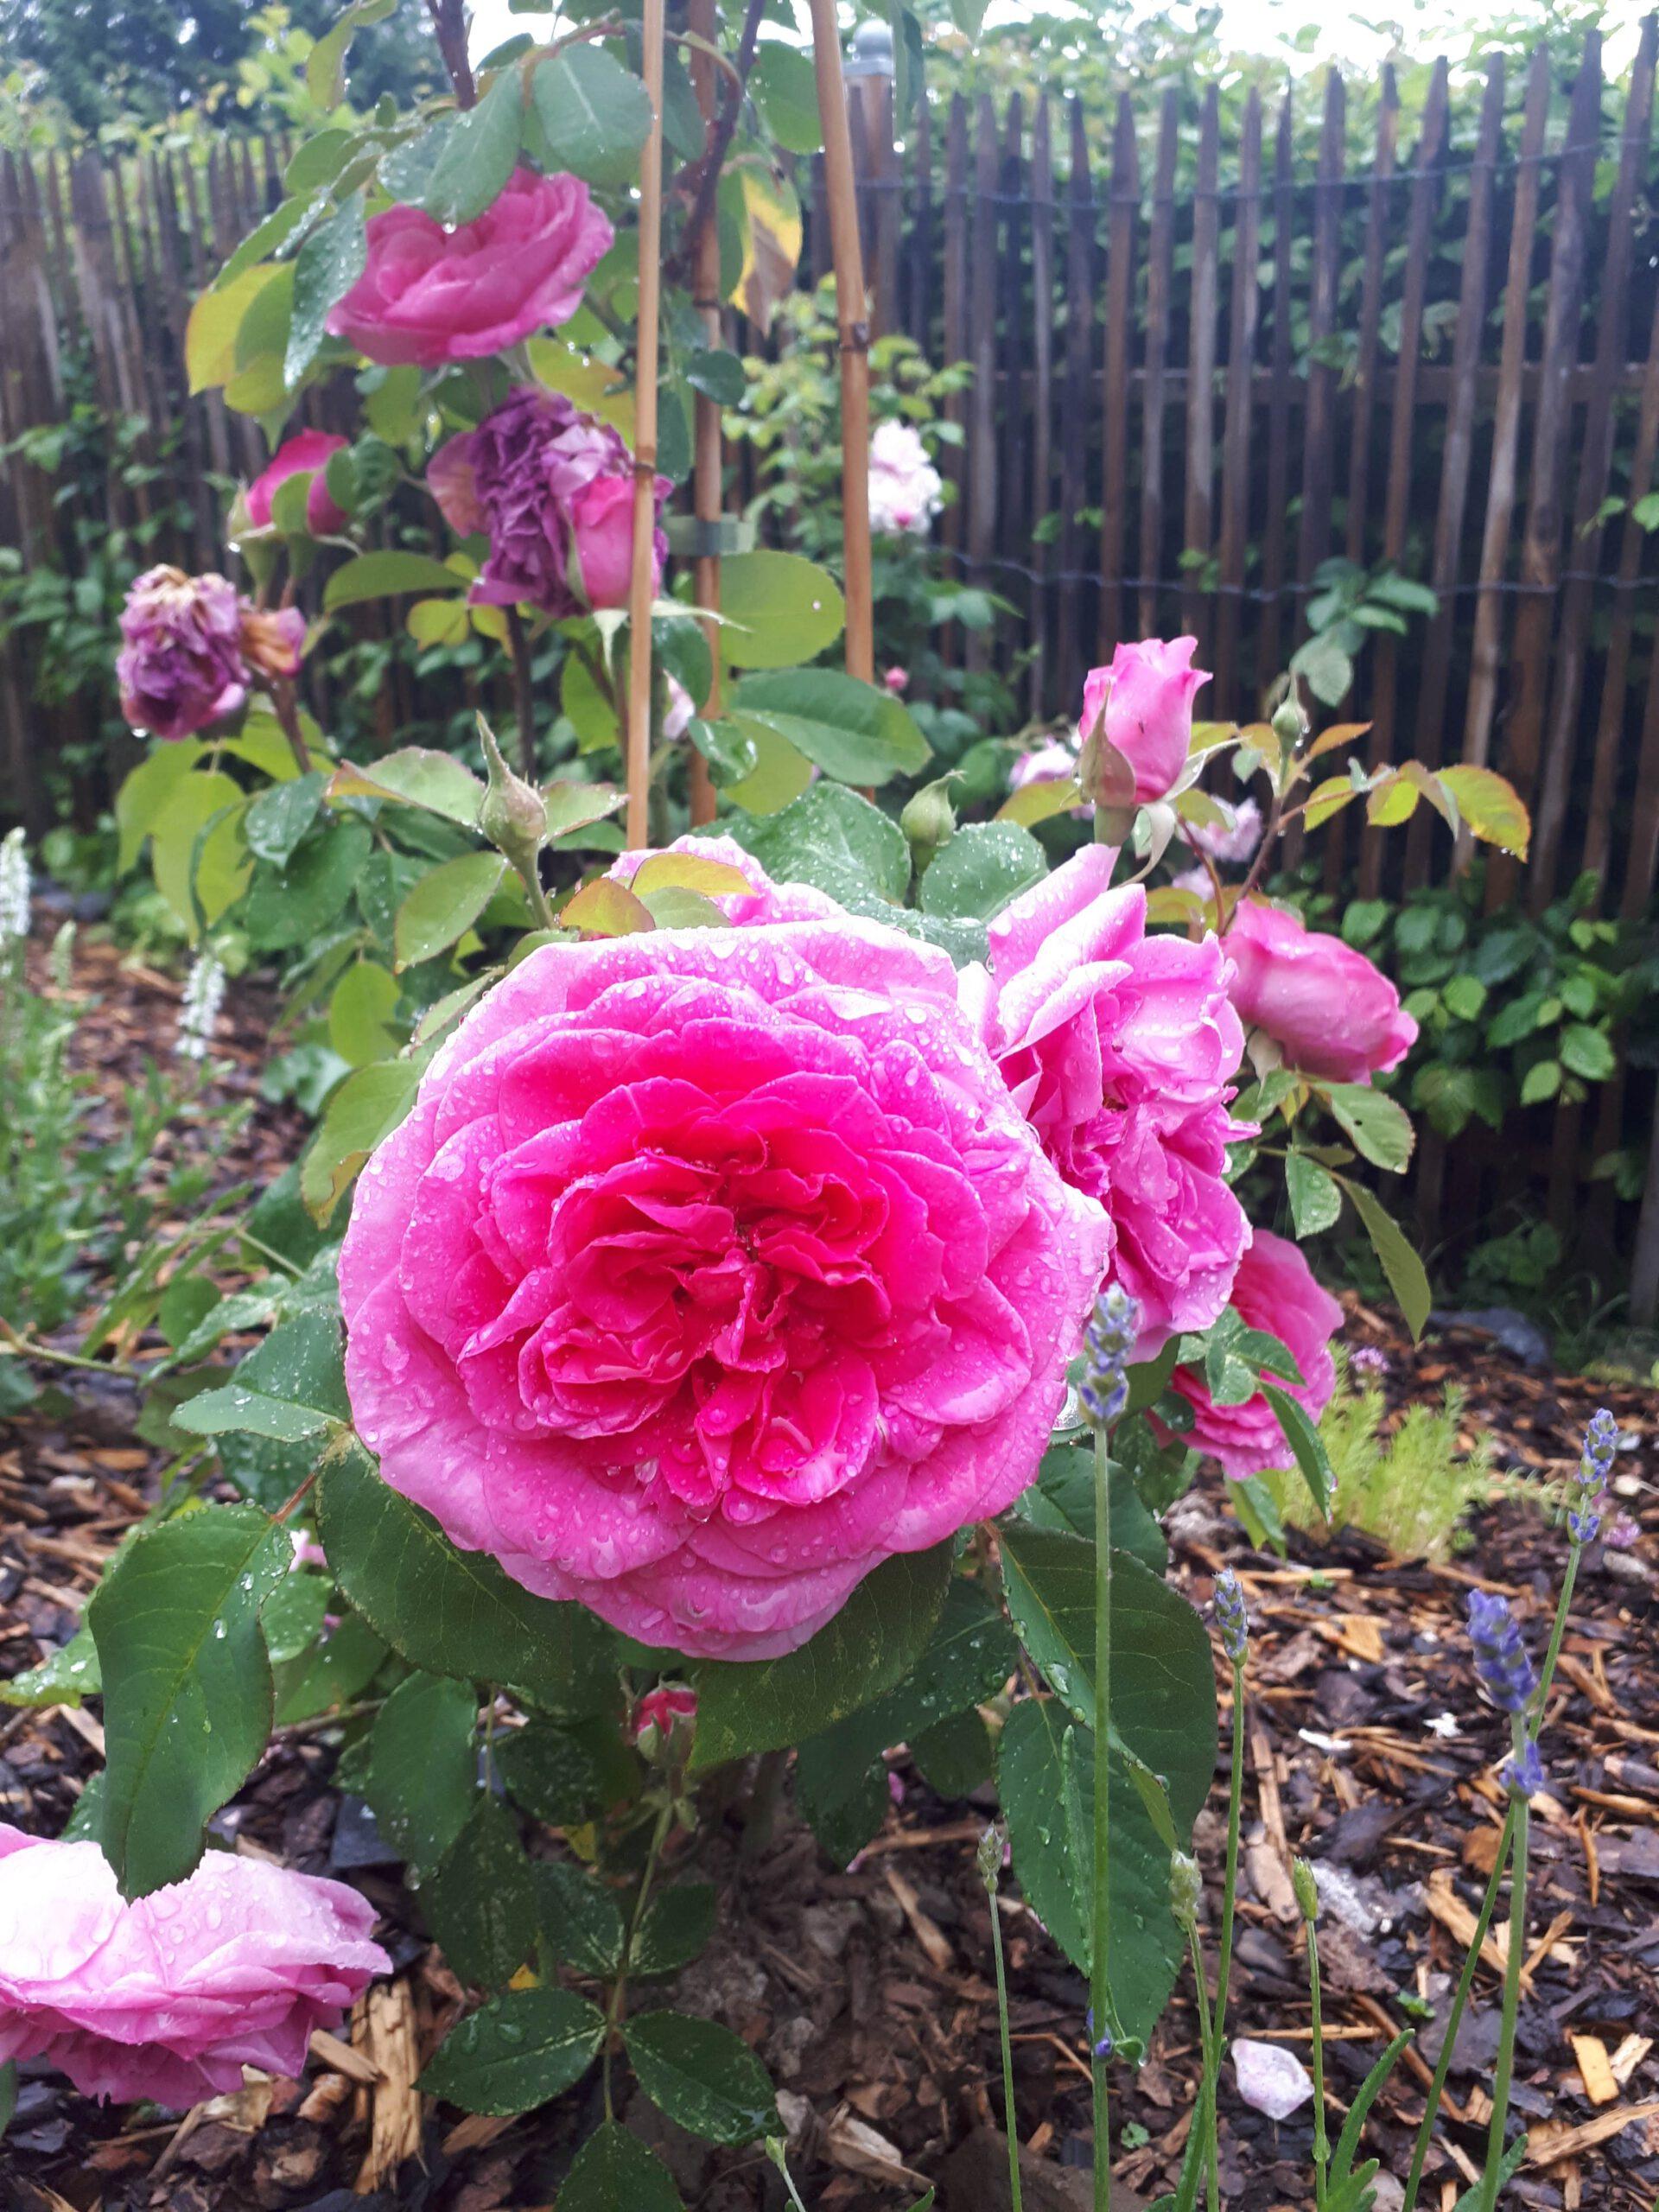 Meine Rosensorten, hier die Sorte Gertrude Jekyll